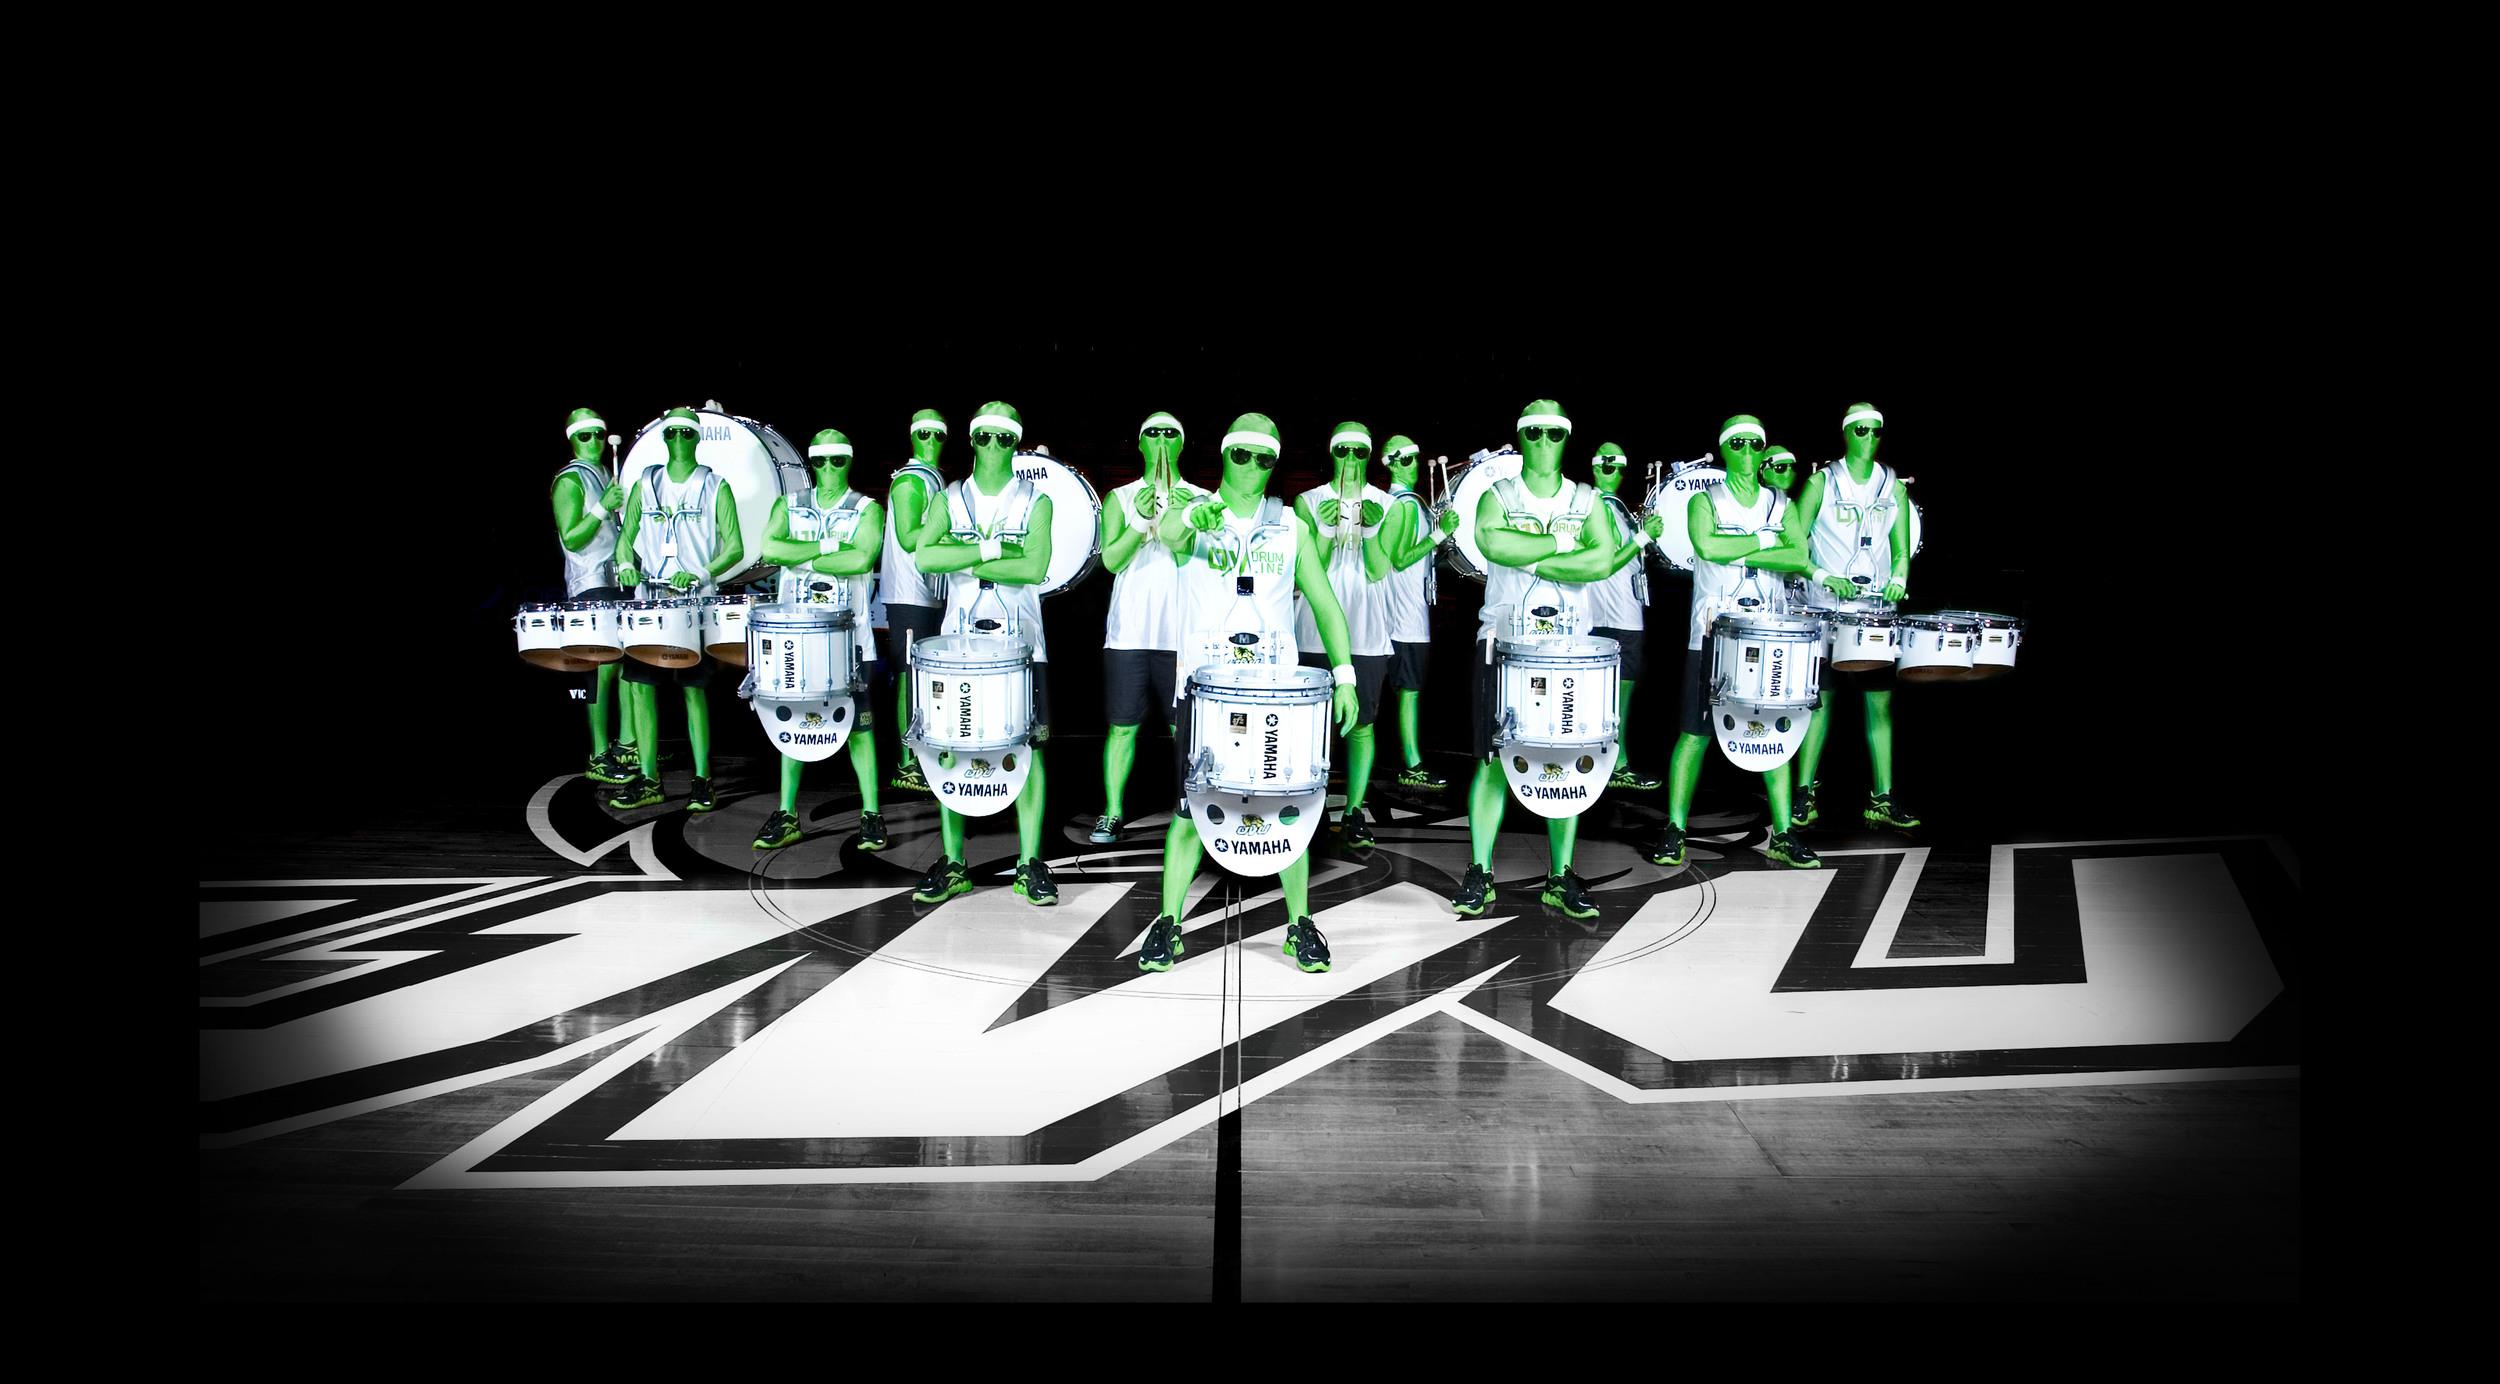 Main Green Man Group Photo3.jpg